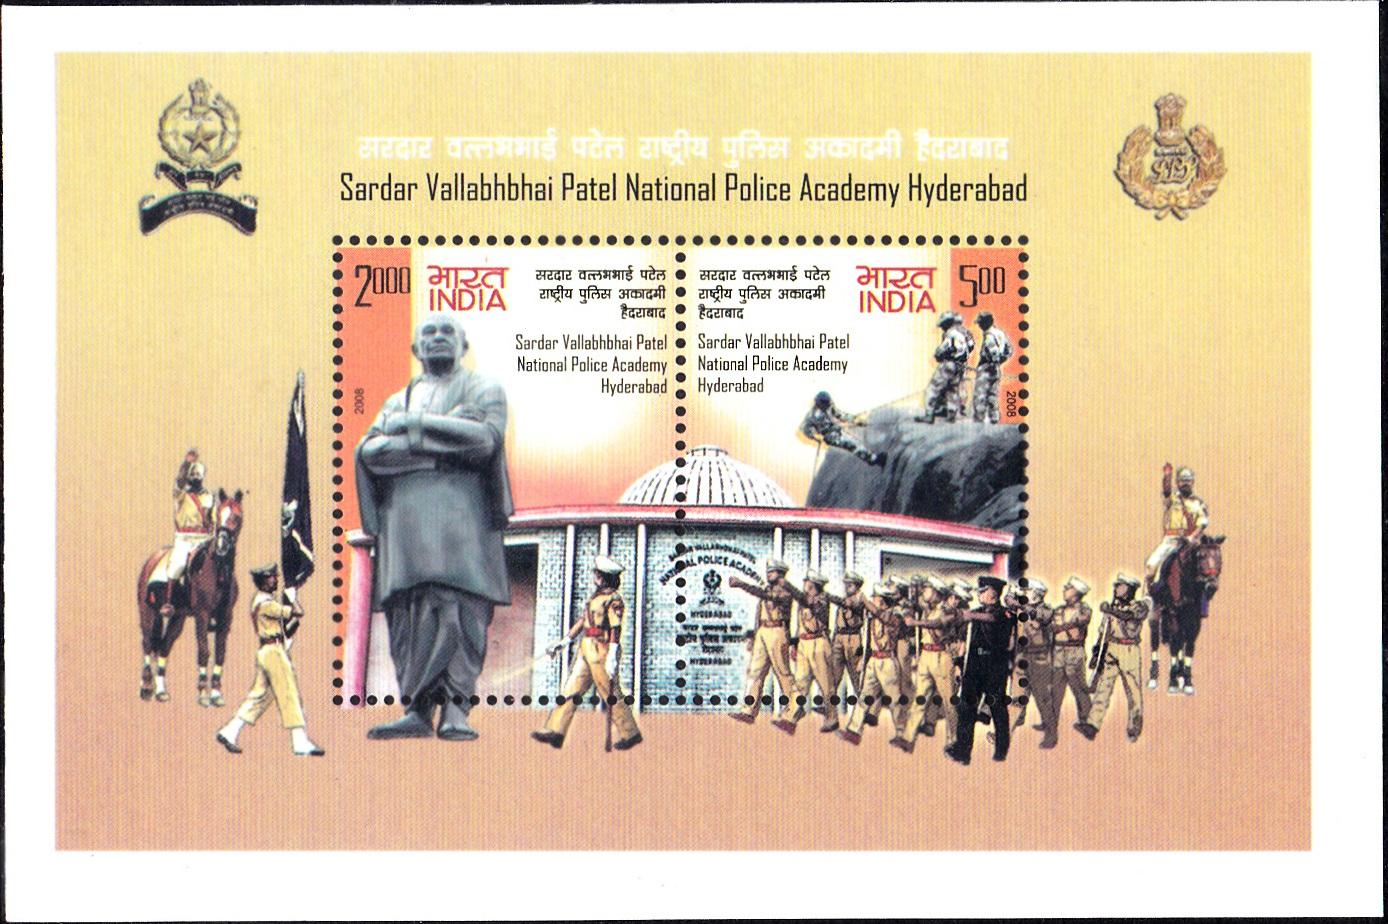 SVPNPA : Deputy Prime Minister Sardar Vallabhbhai Patel